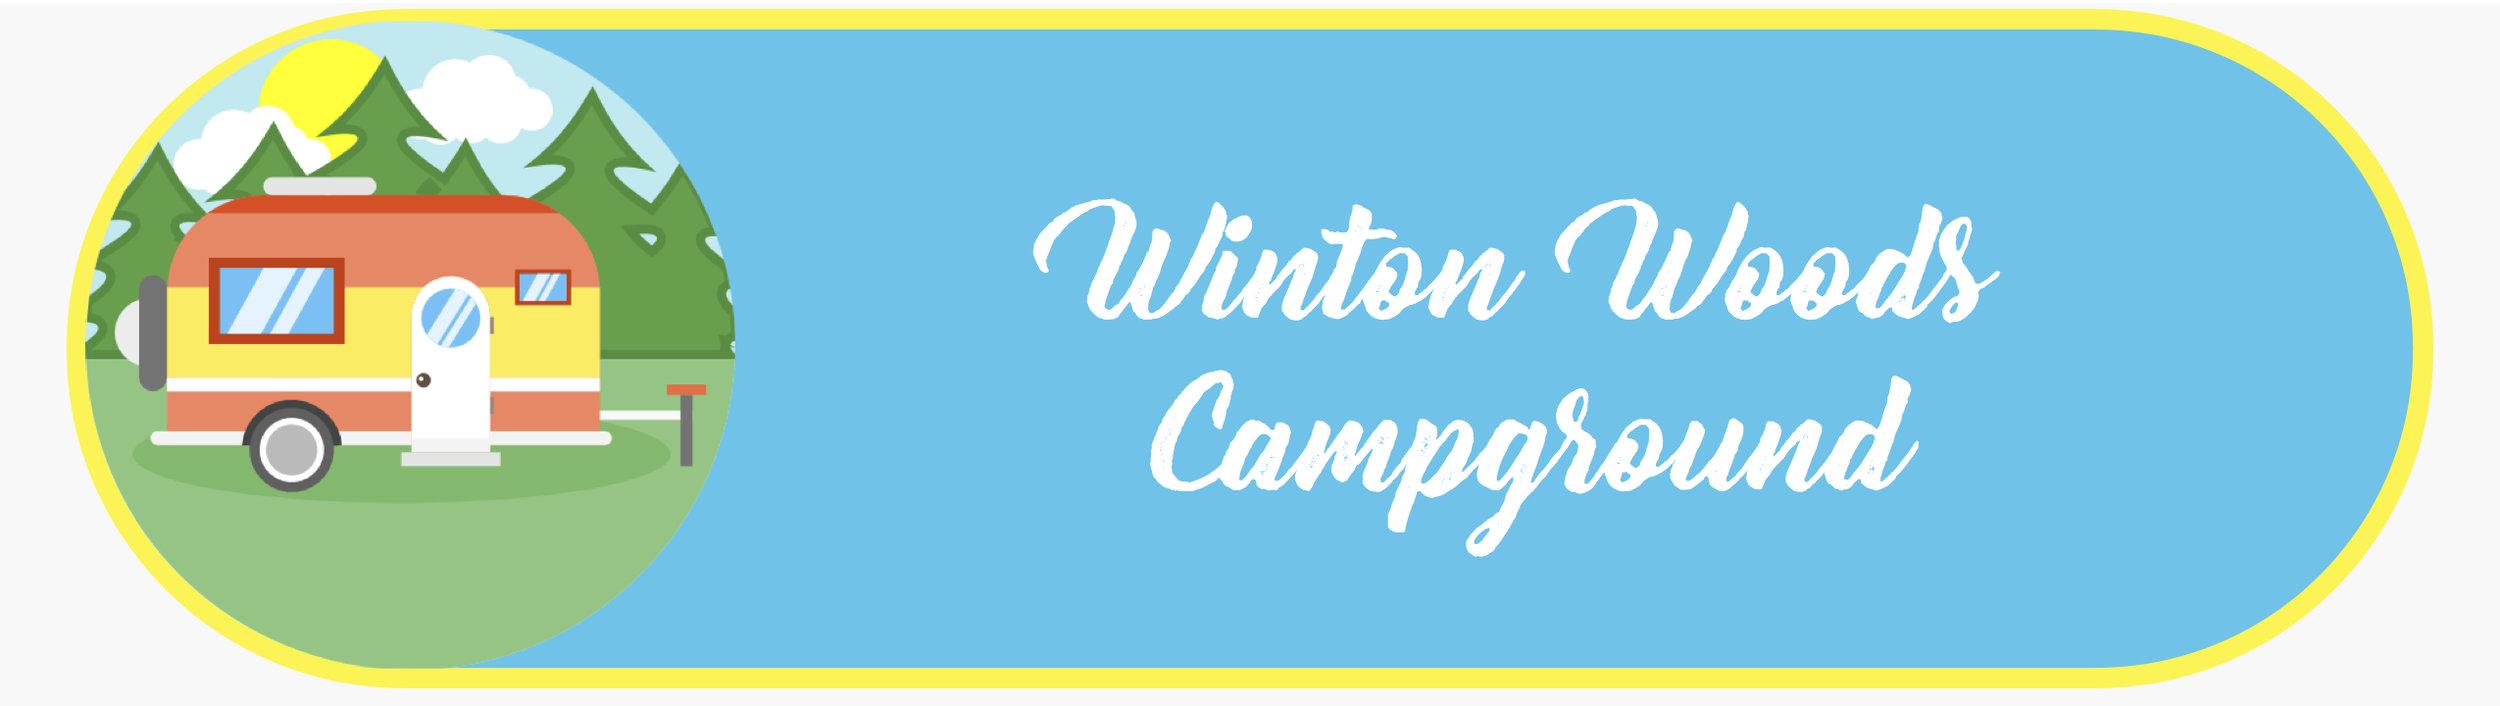 Winton Woods.jpg